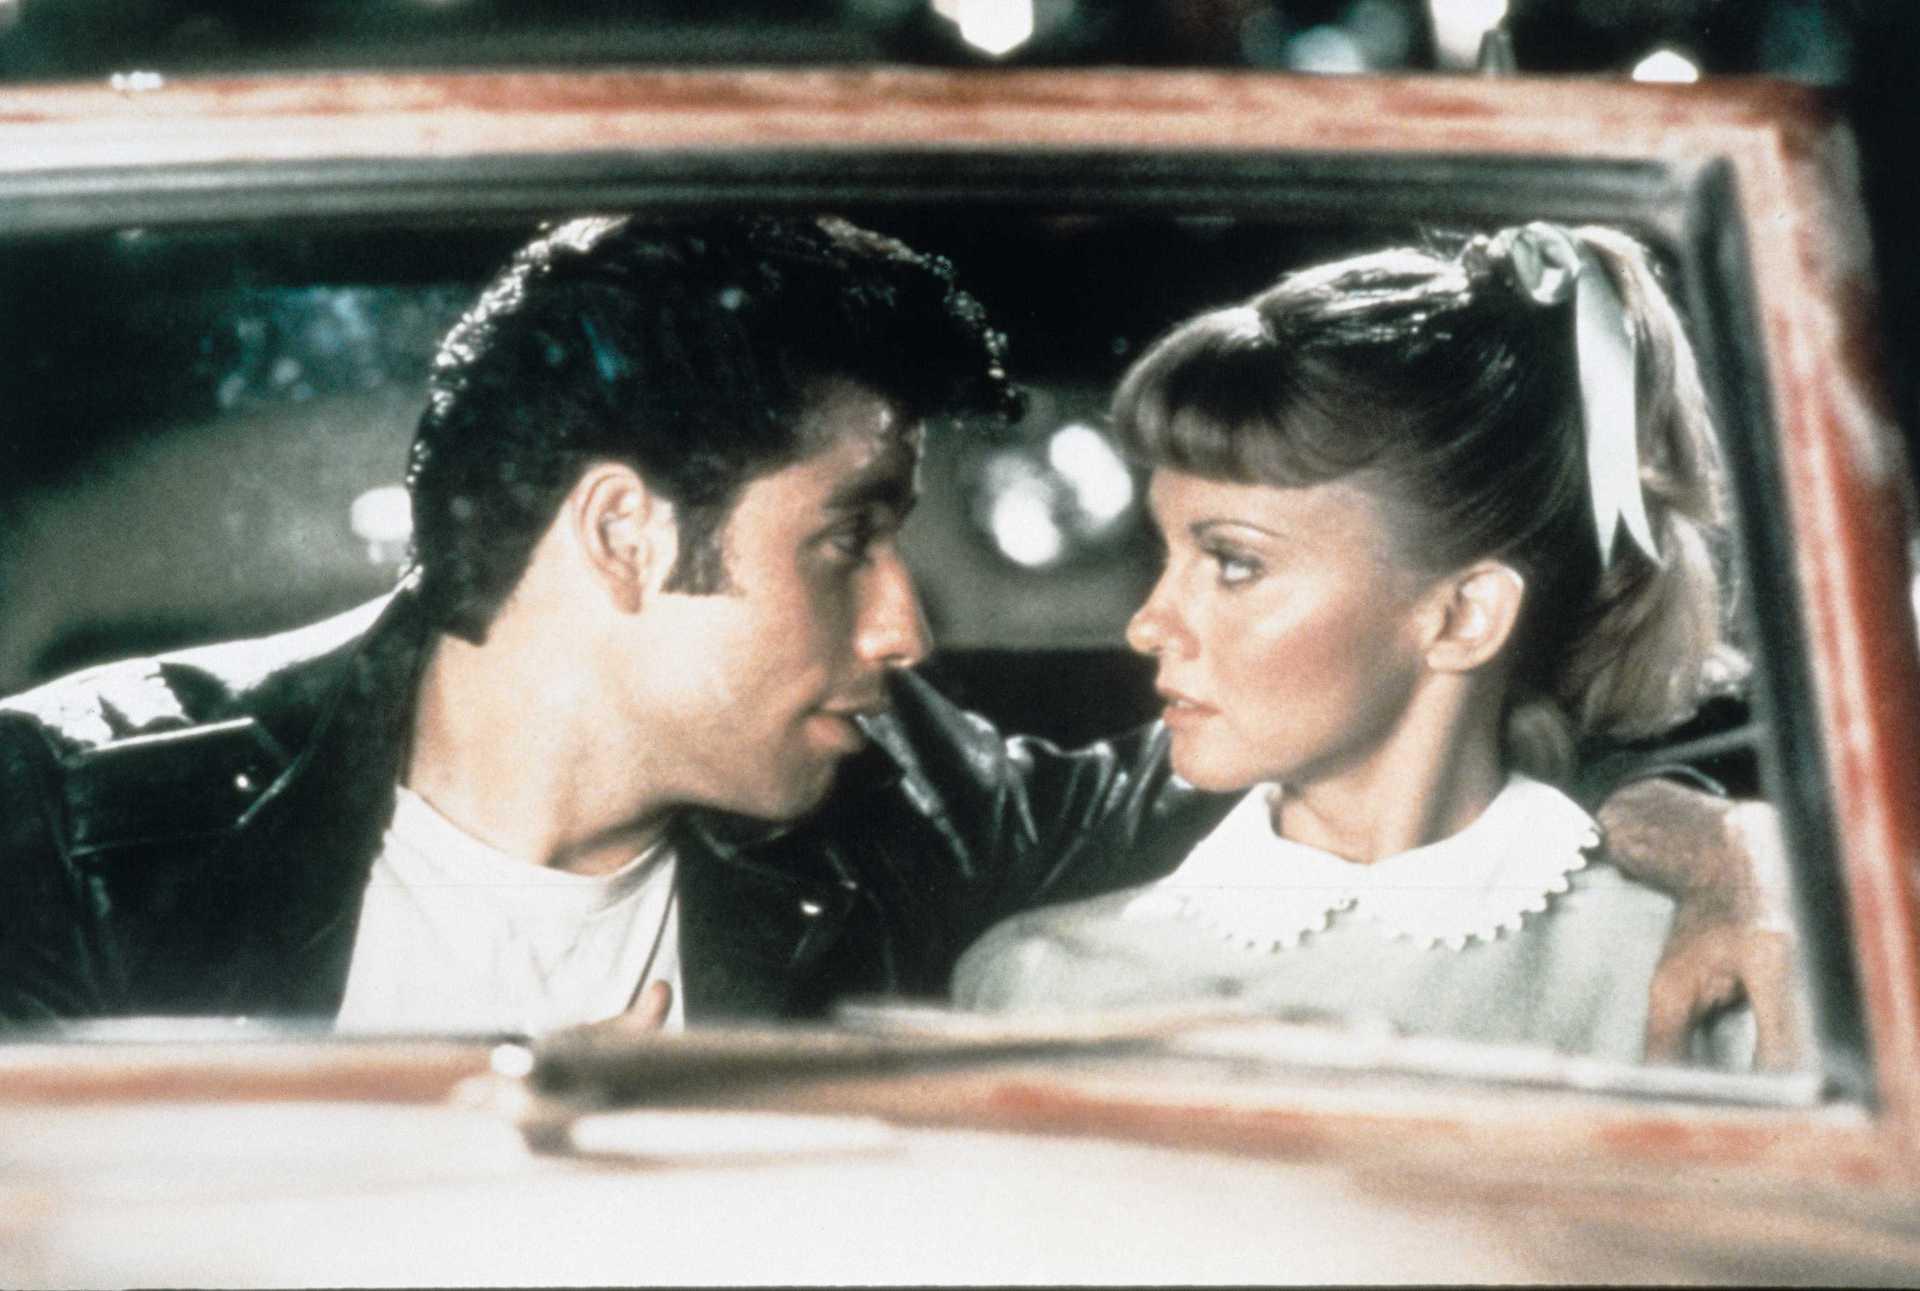 John travolta in the movie grease